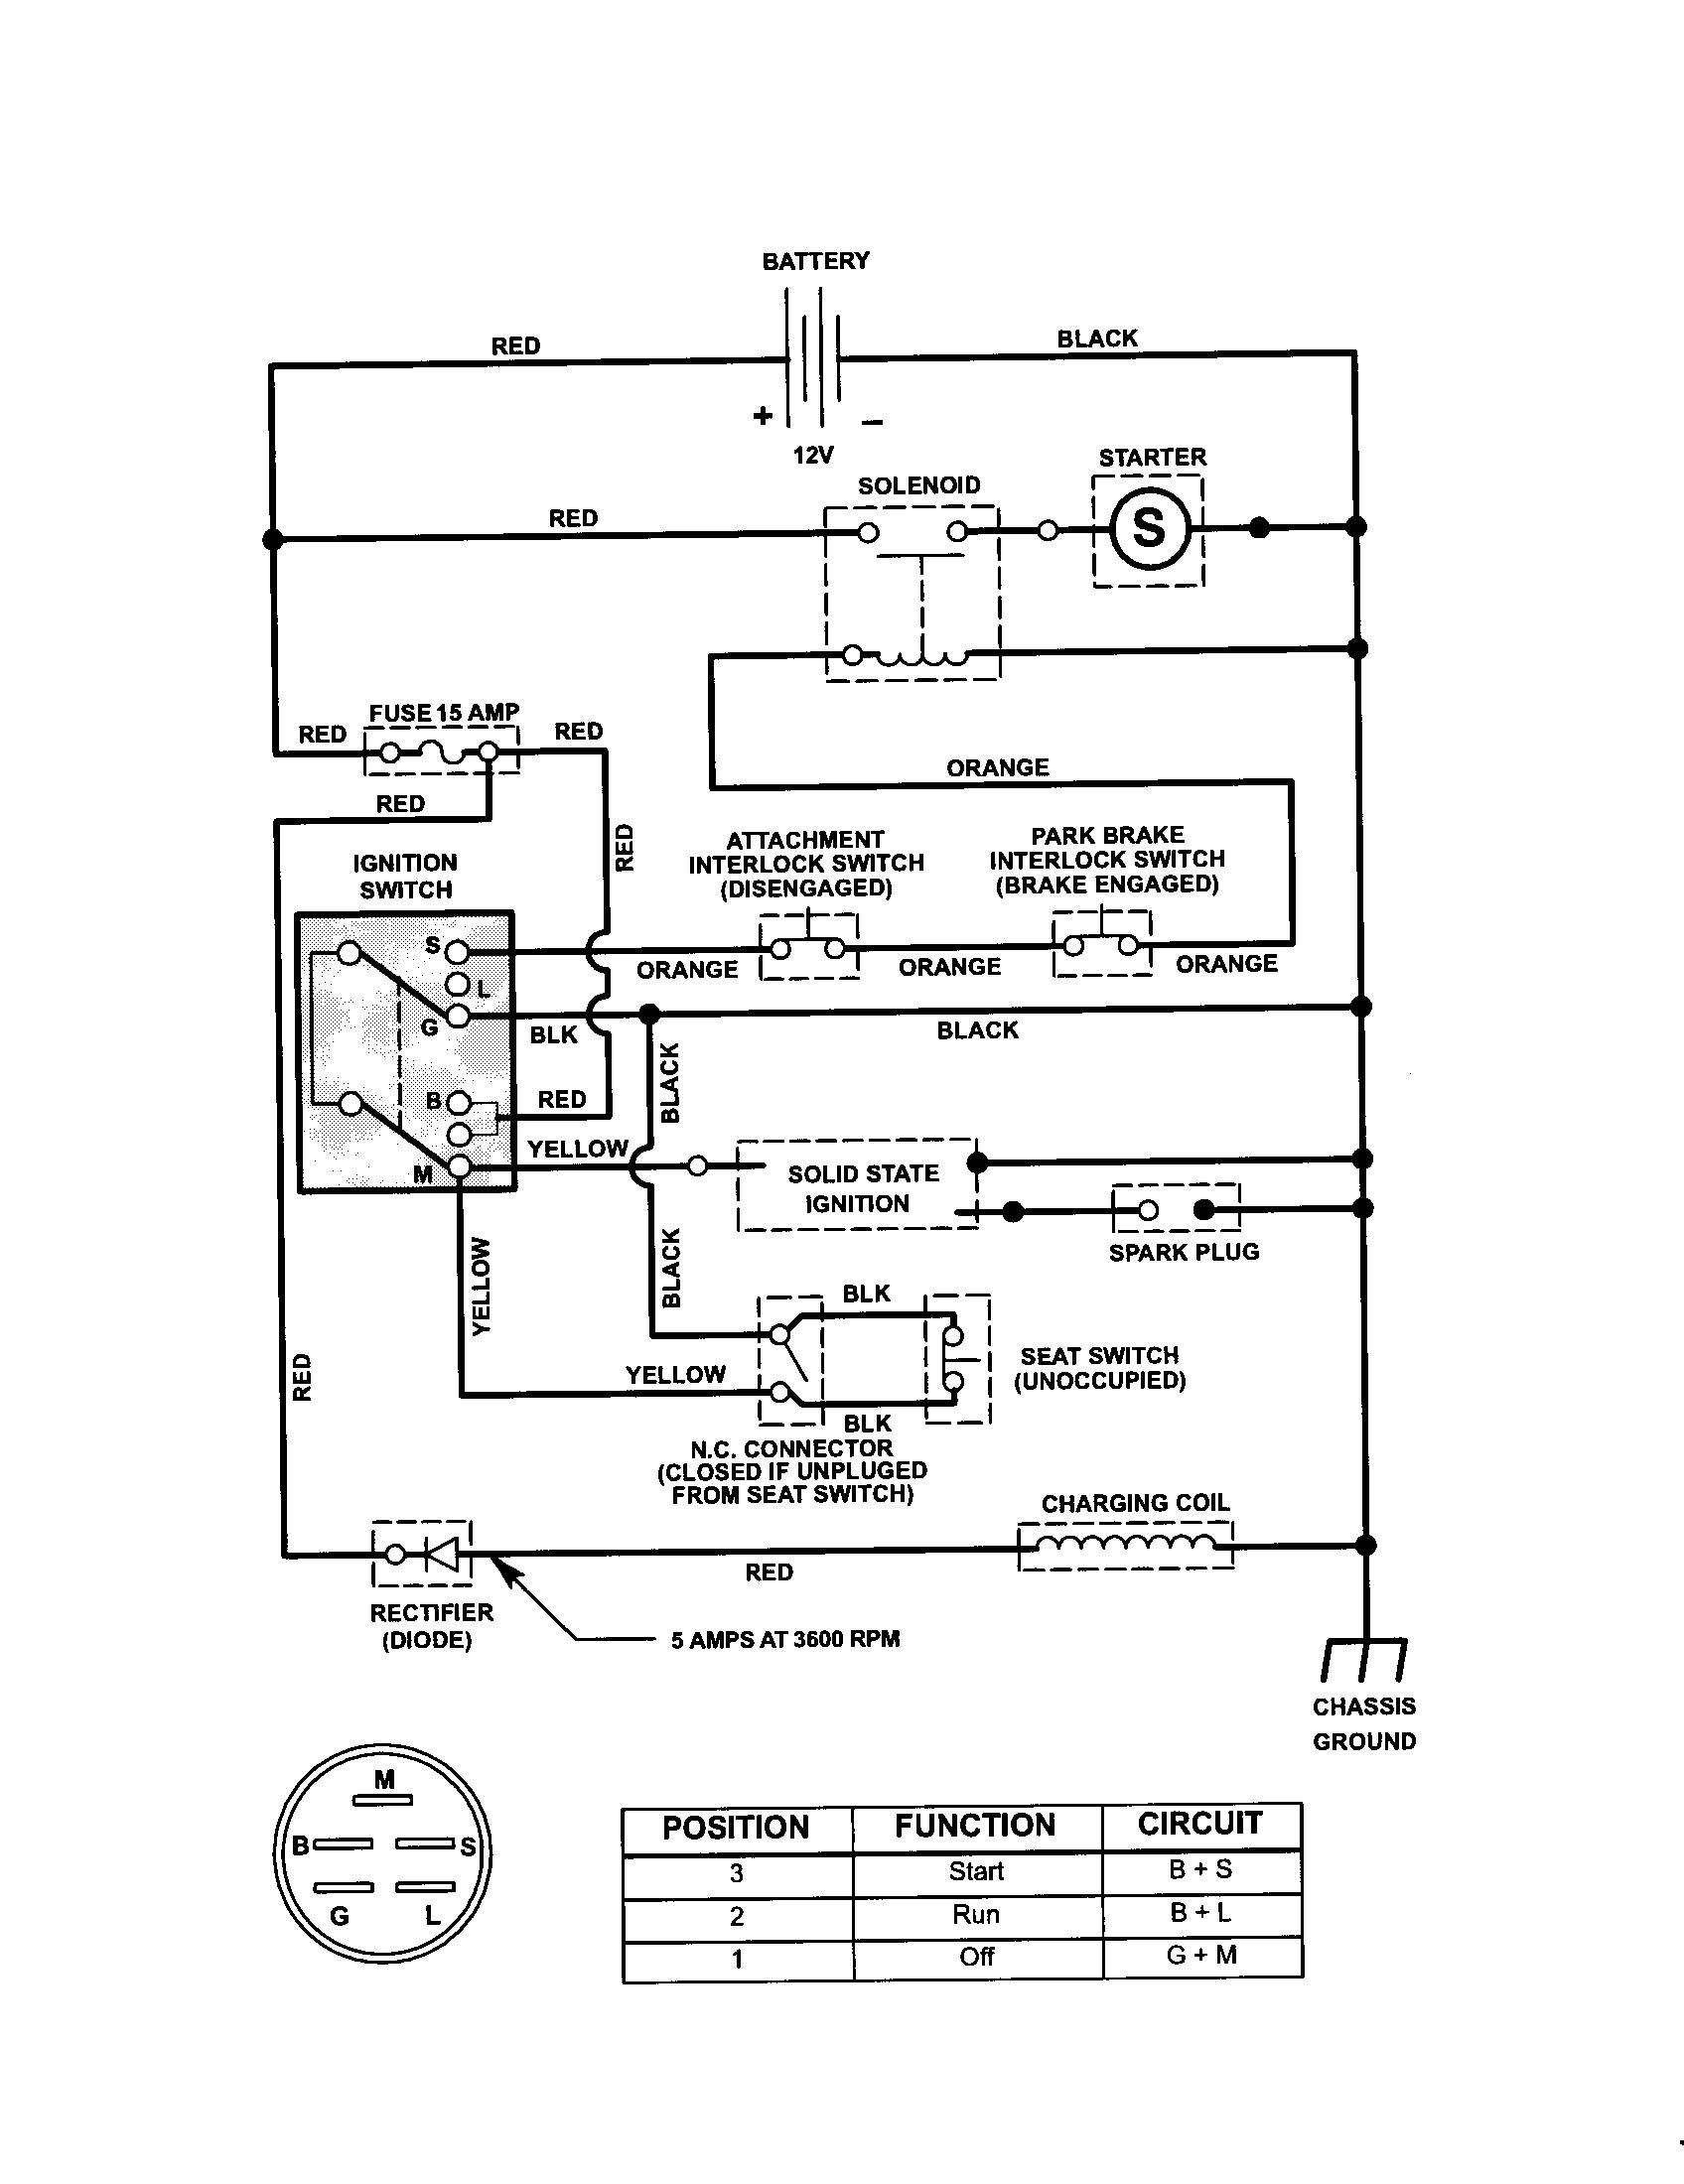 john deere model b engine diagram [ 1696 x 2200 Pixel ]